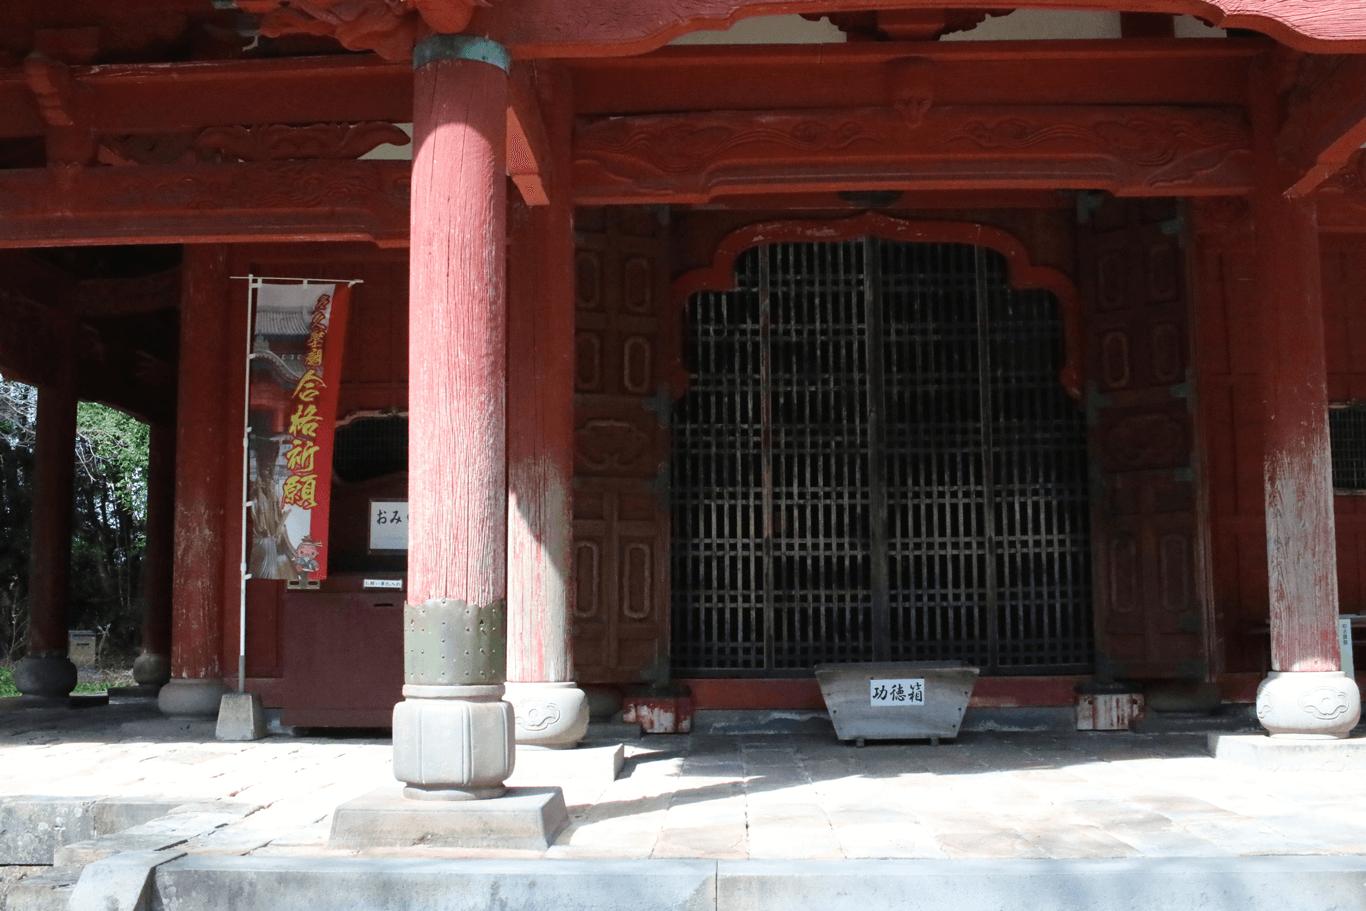 ART|レジデンス事業|多久市|多久聖廟|takuseibyou